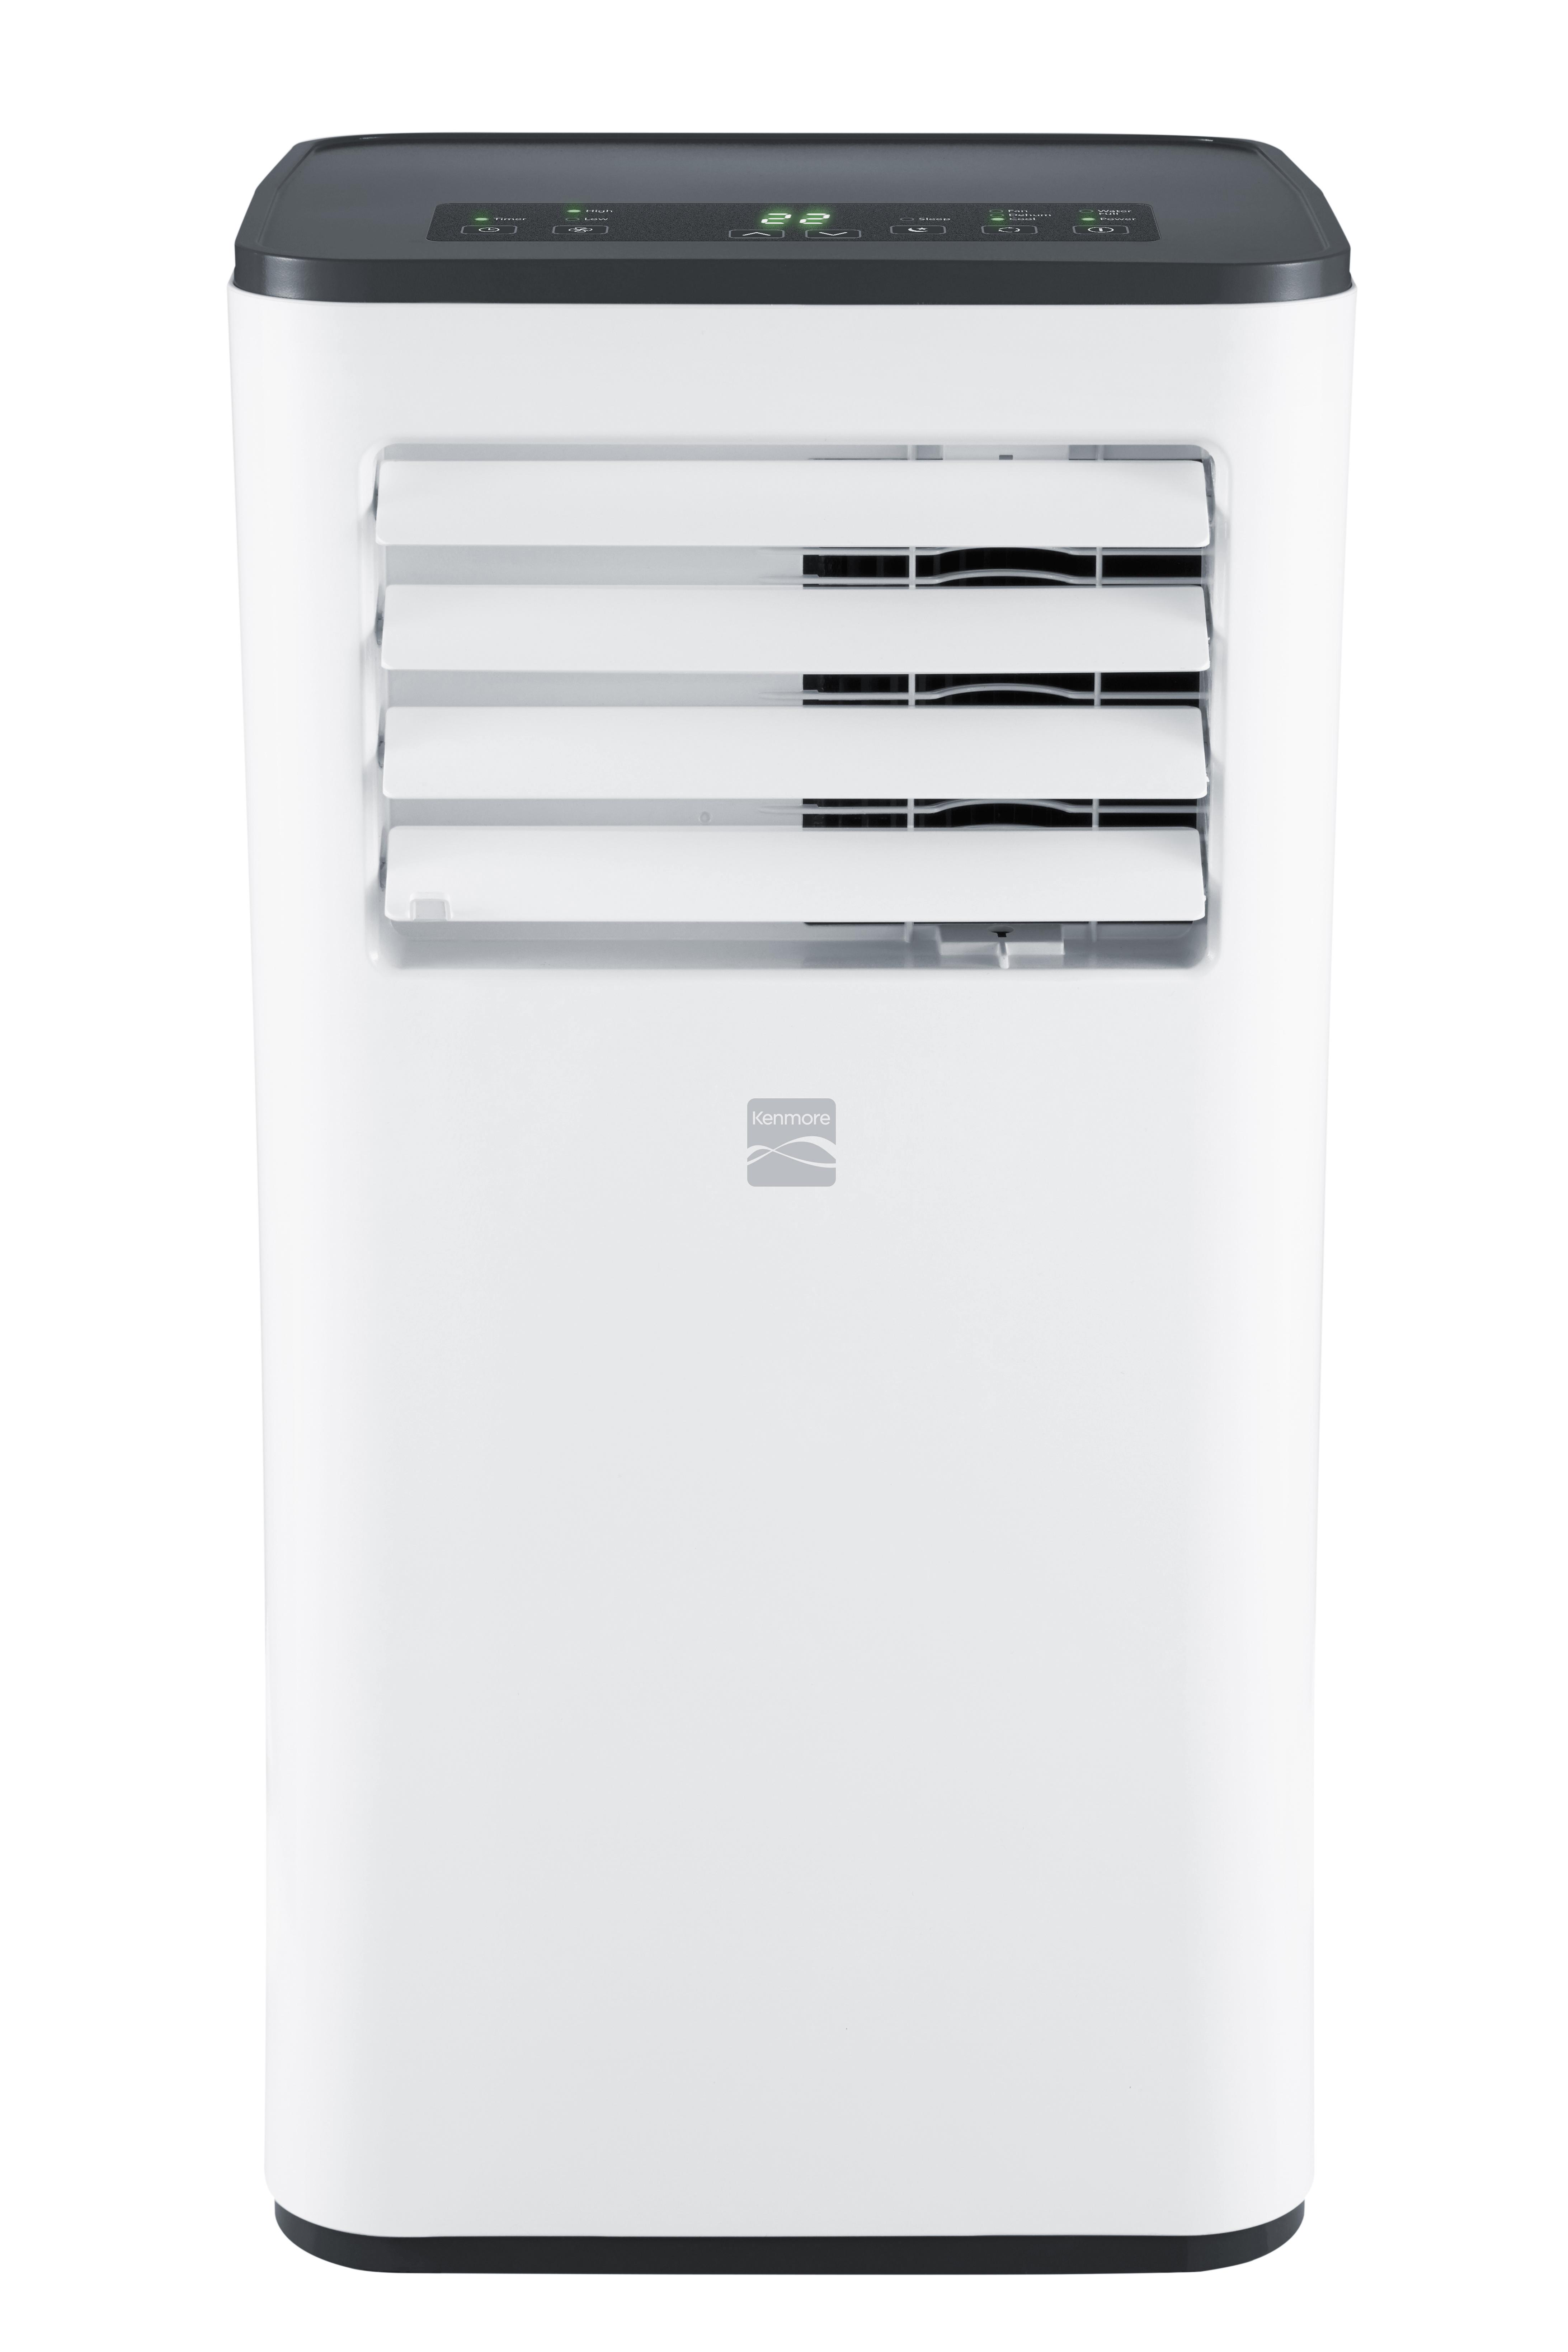 Kenmore 77086 8,000 BTU Portable Air Conditioner, White